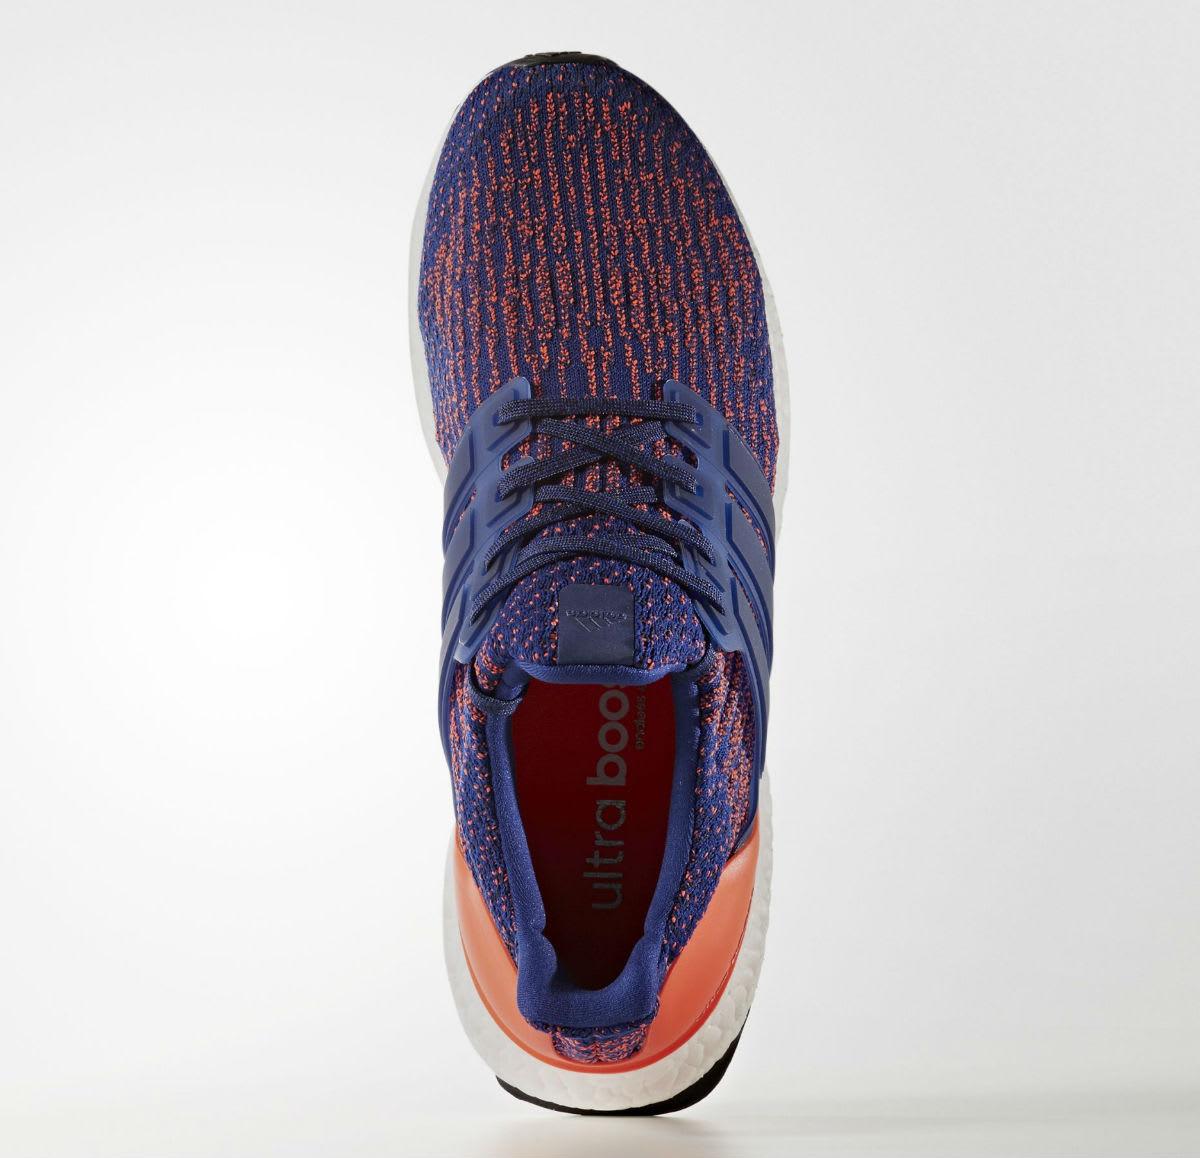 198b5657c ... norway adidas ultra boost 3.0 purple orange release date top s82020  d143e f6eeb